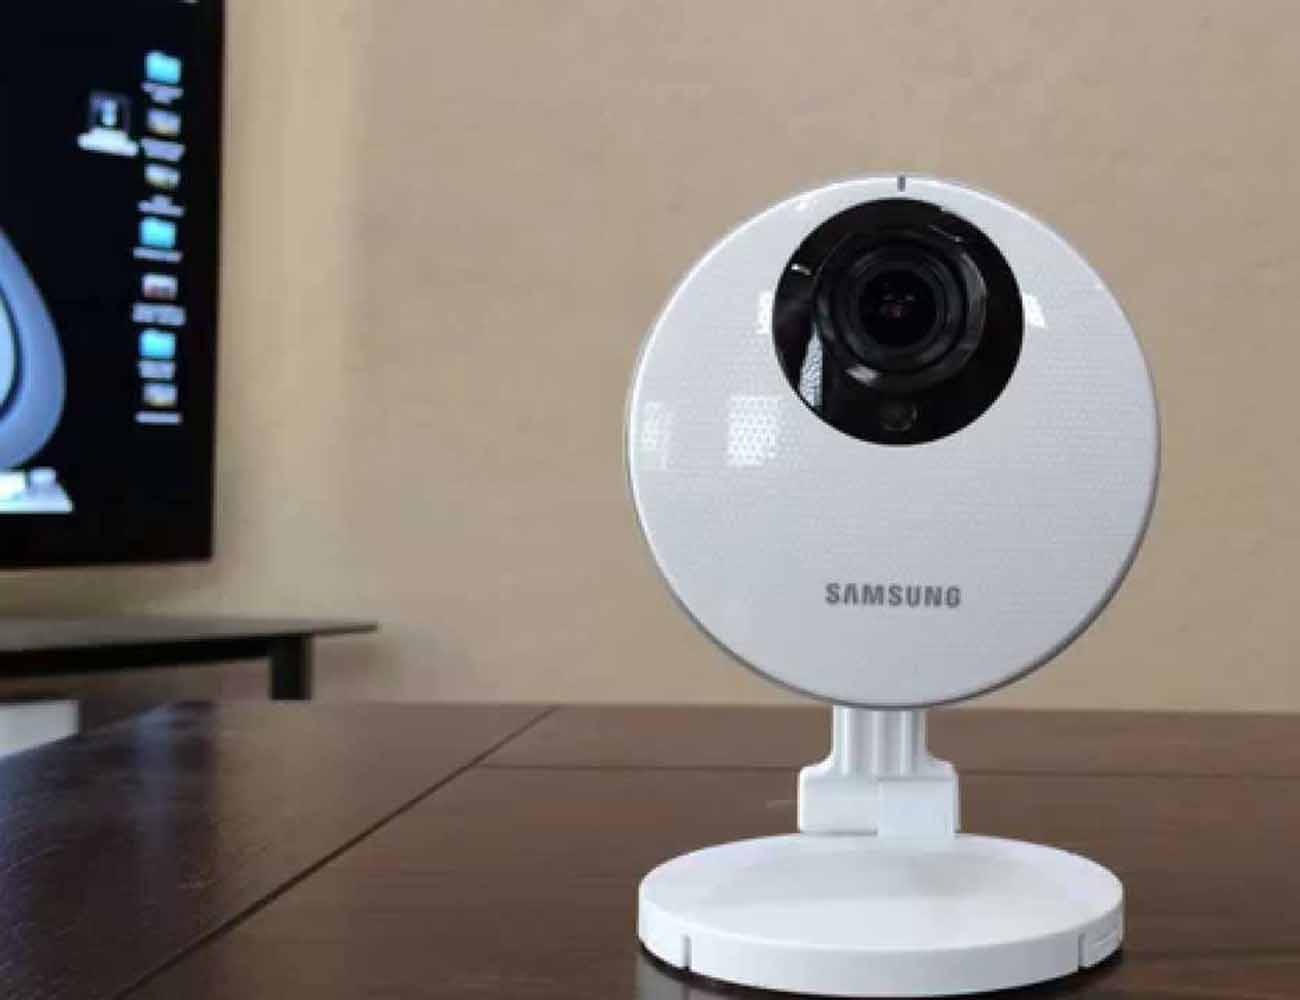 Samsung SmartCam HD Pro Wi-Fi Camera